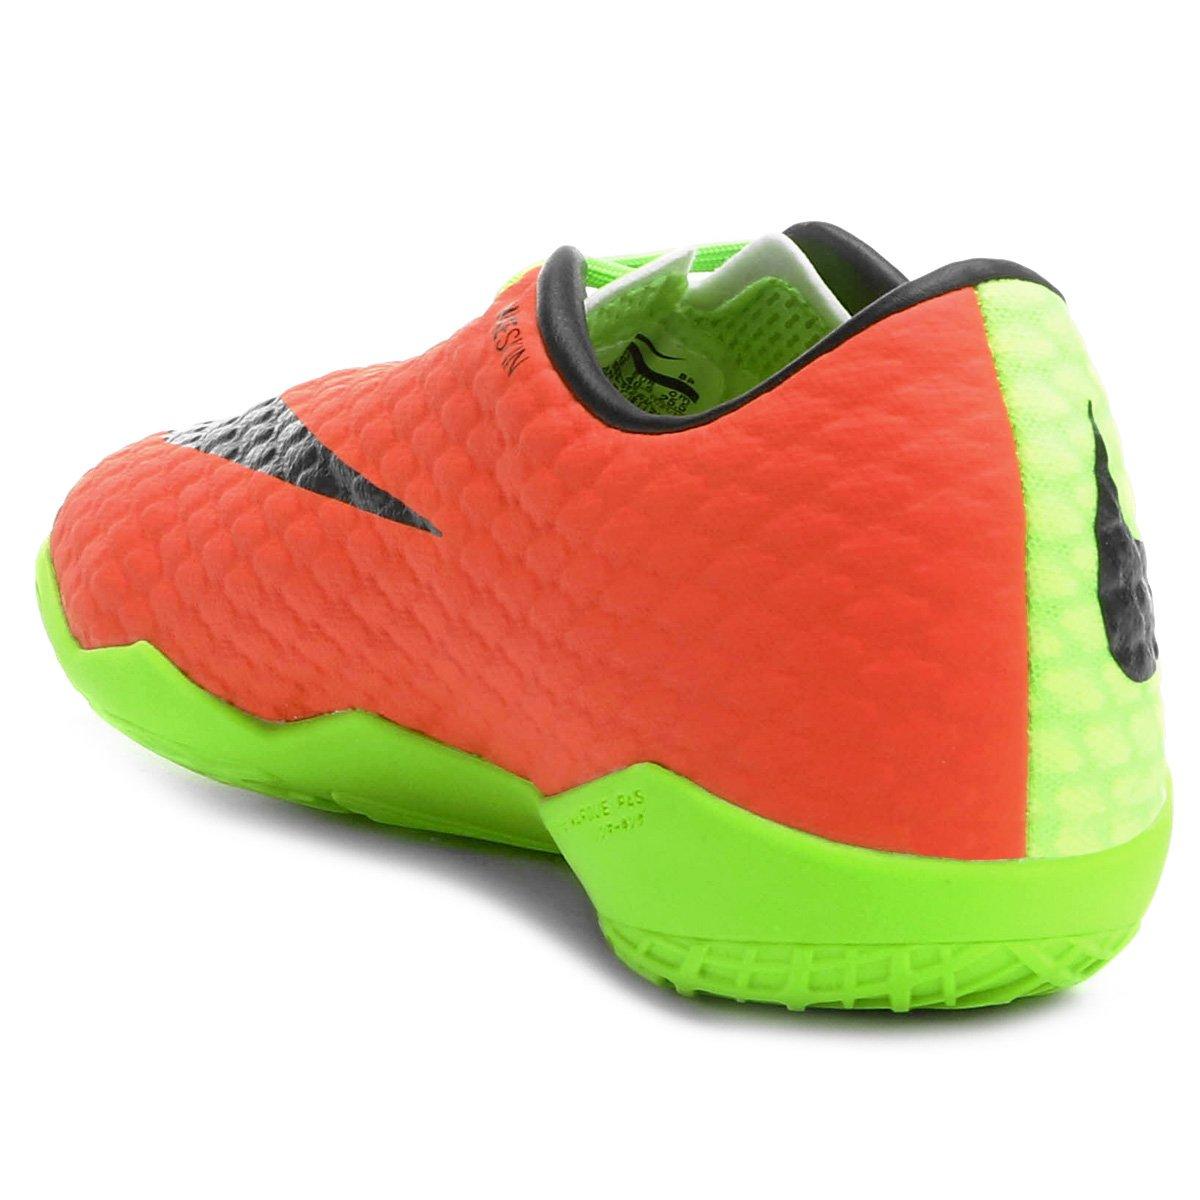 Chuteira Futsal Nike Hypervenom Phelon 3 IC - Compre Agora  3d26528a96ac8